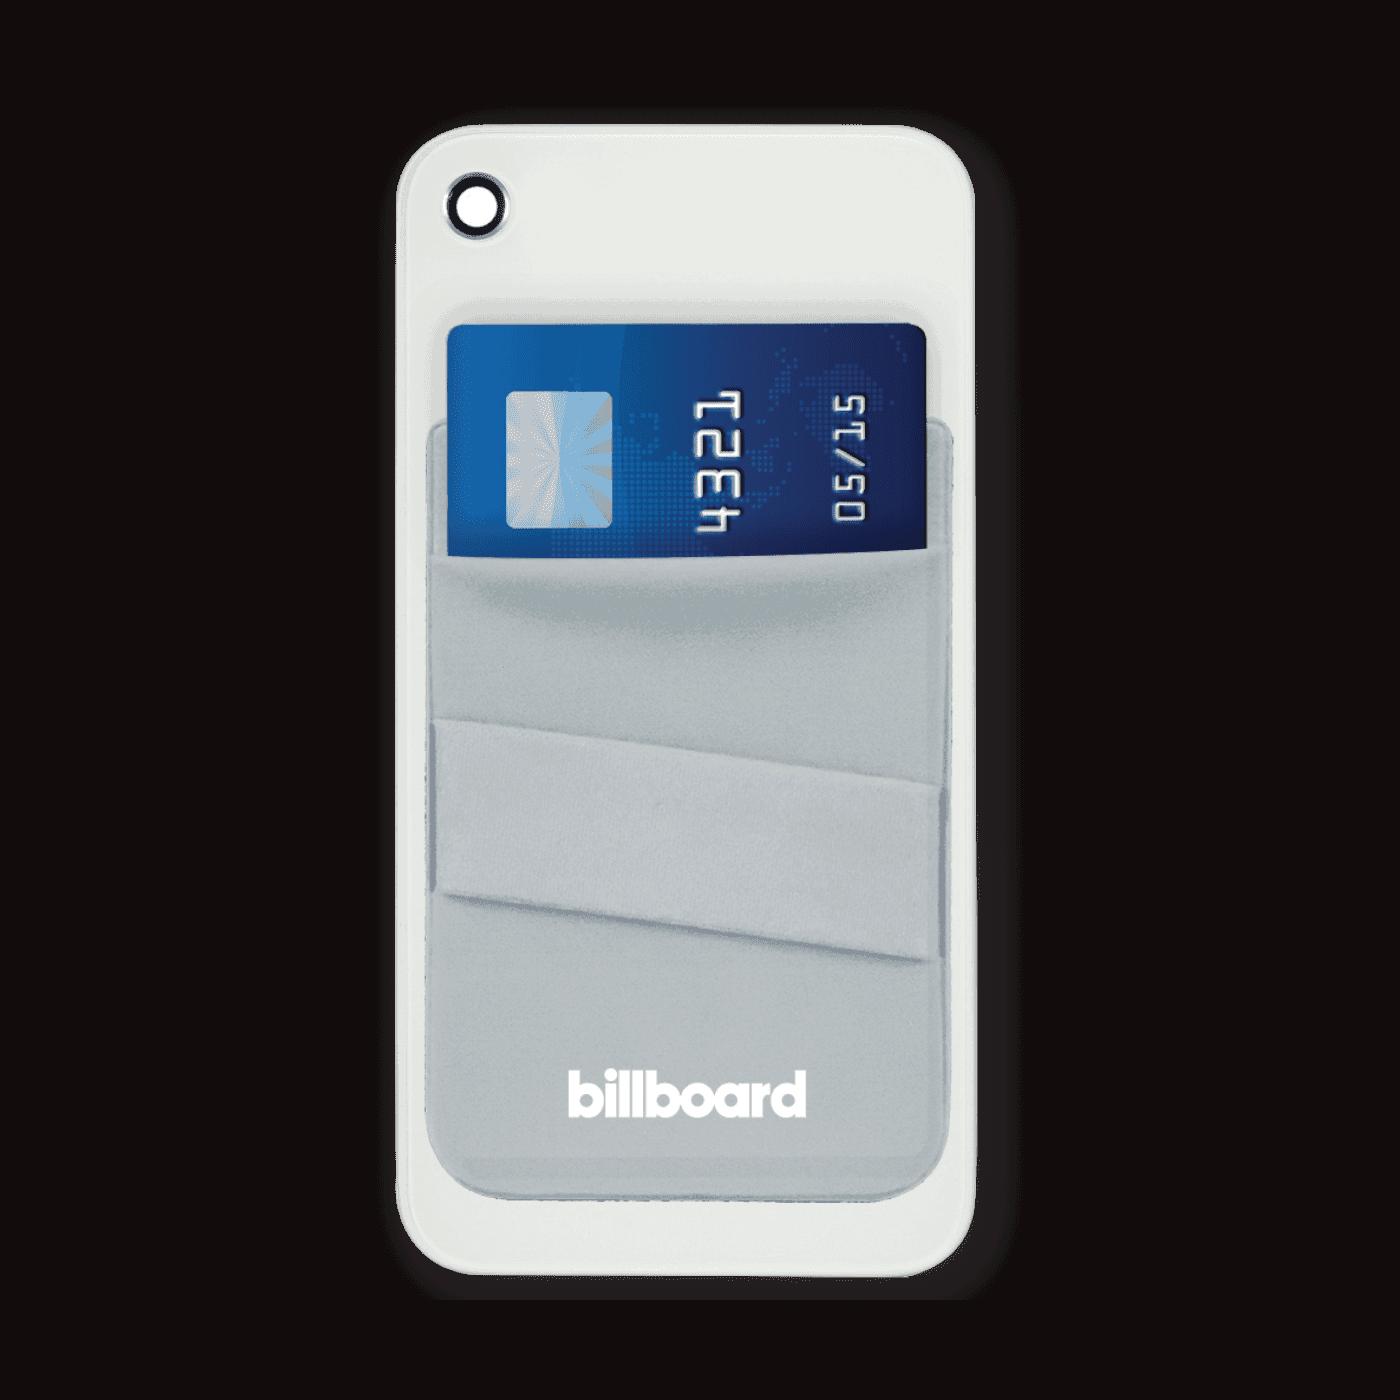 Billboard Adhesive Wallet/ Card Holder For Smartphones Gray